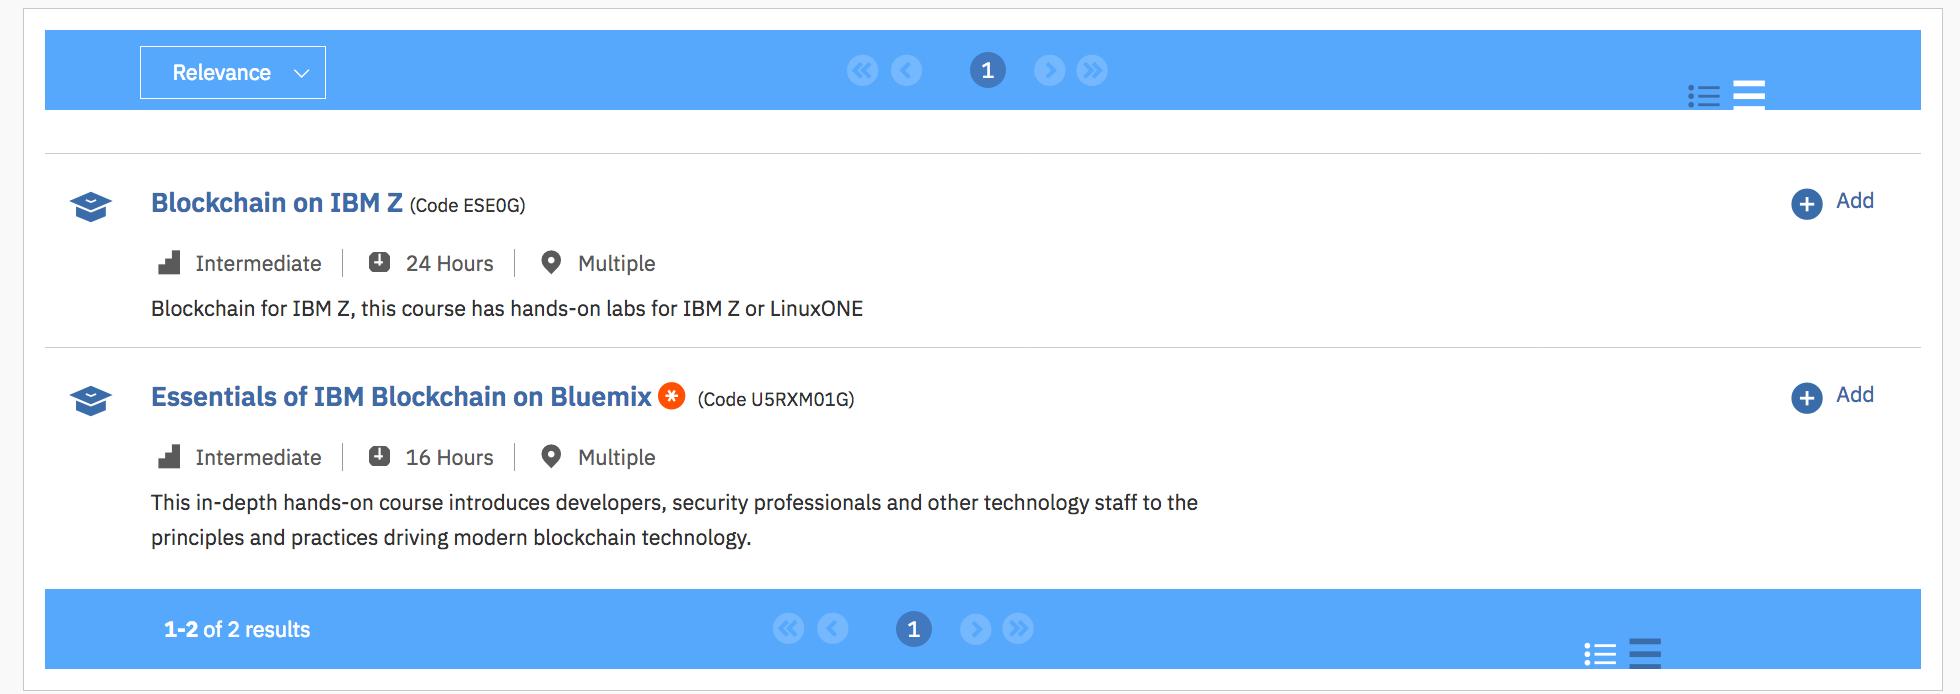 Demystifying and learning Blockchain - IBM Training and Skills Blog